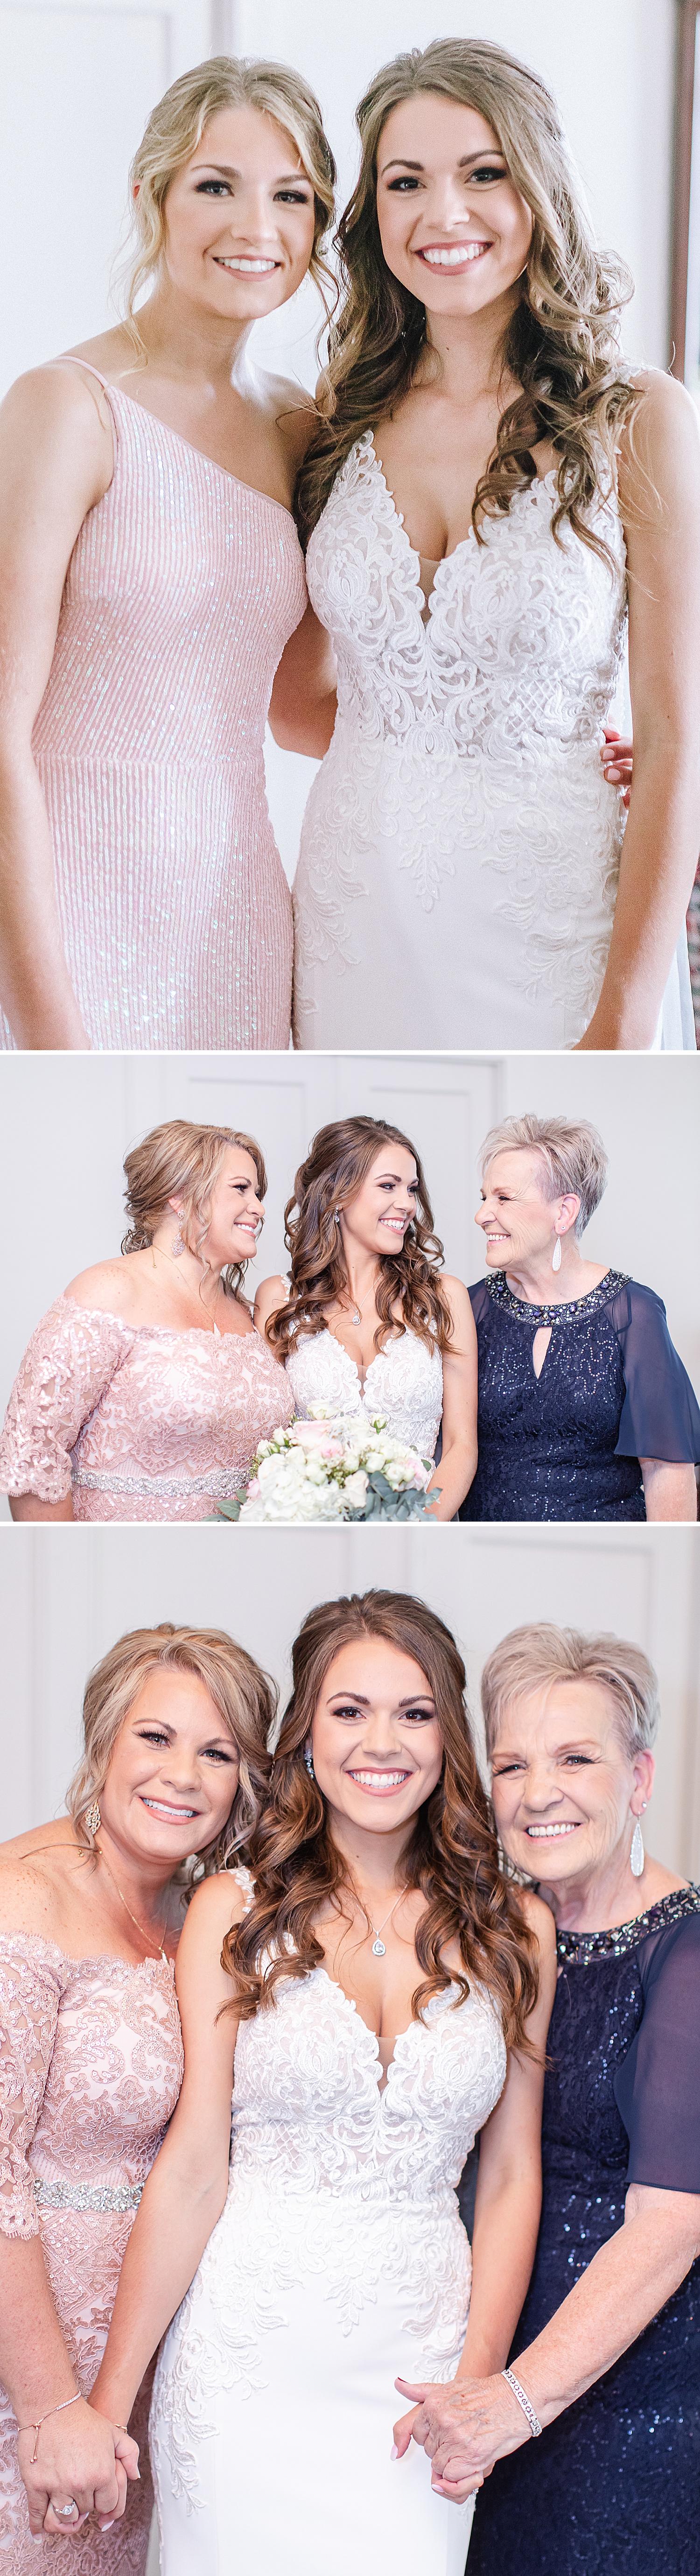 Military-AIr-Force-Wedding-Seguin-LaVernia-Texas-Carly-Barton-Photography_0010.jpg